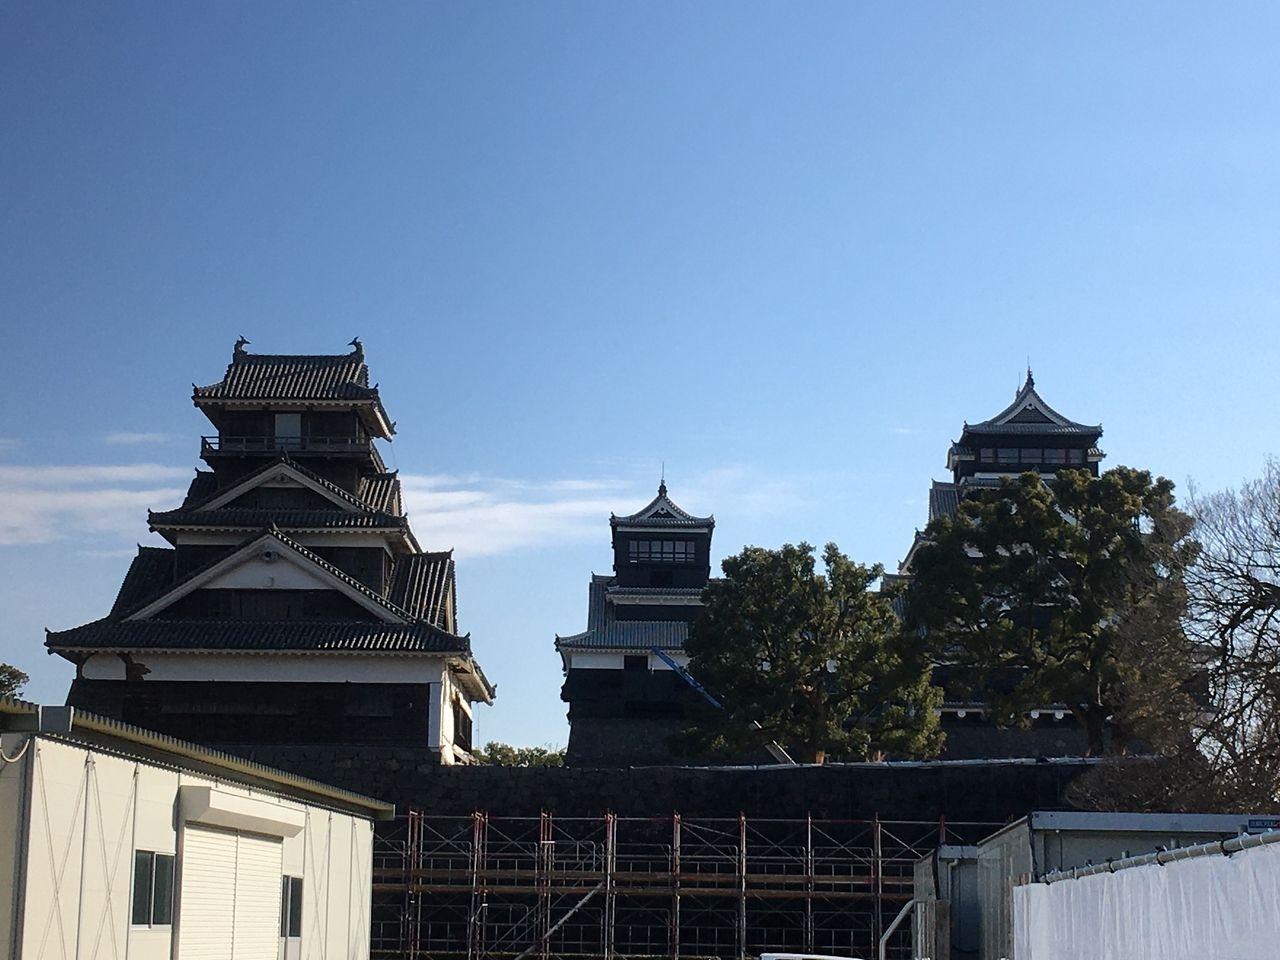 熊本城 天守閣 二の丸 宇土櫓